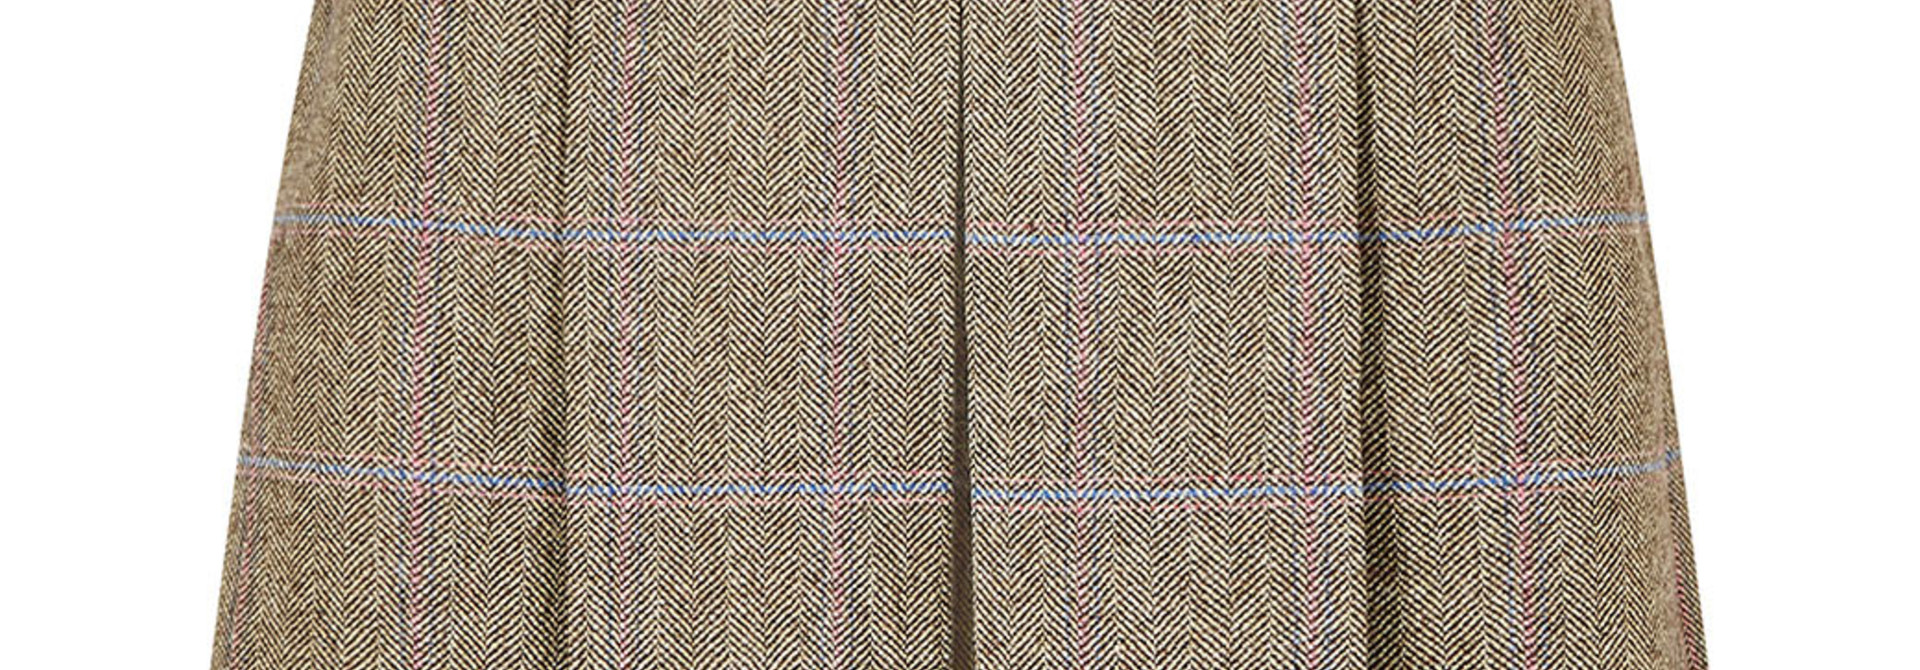 Dubarry Spruce Tweed Rok - Woodrose